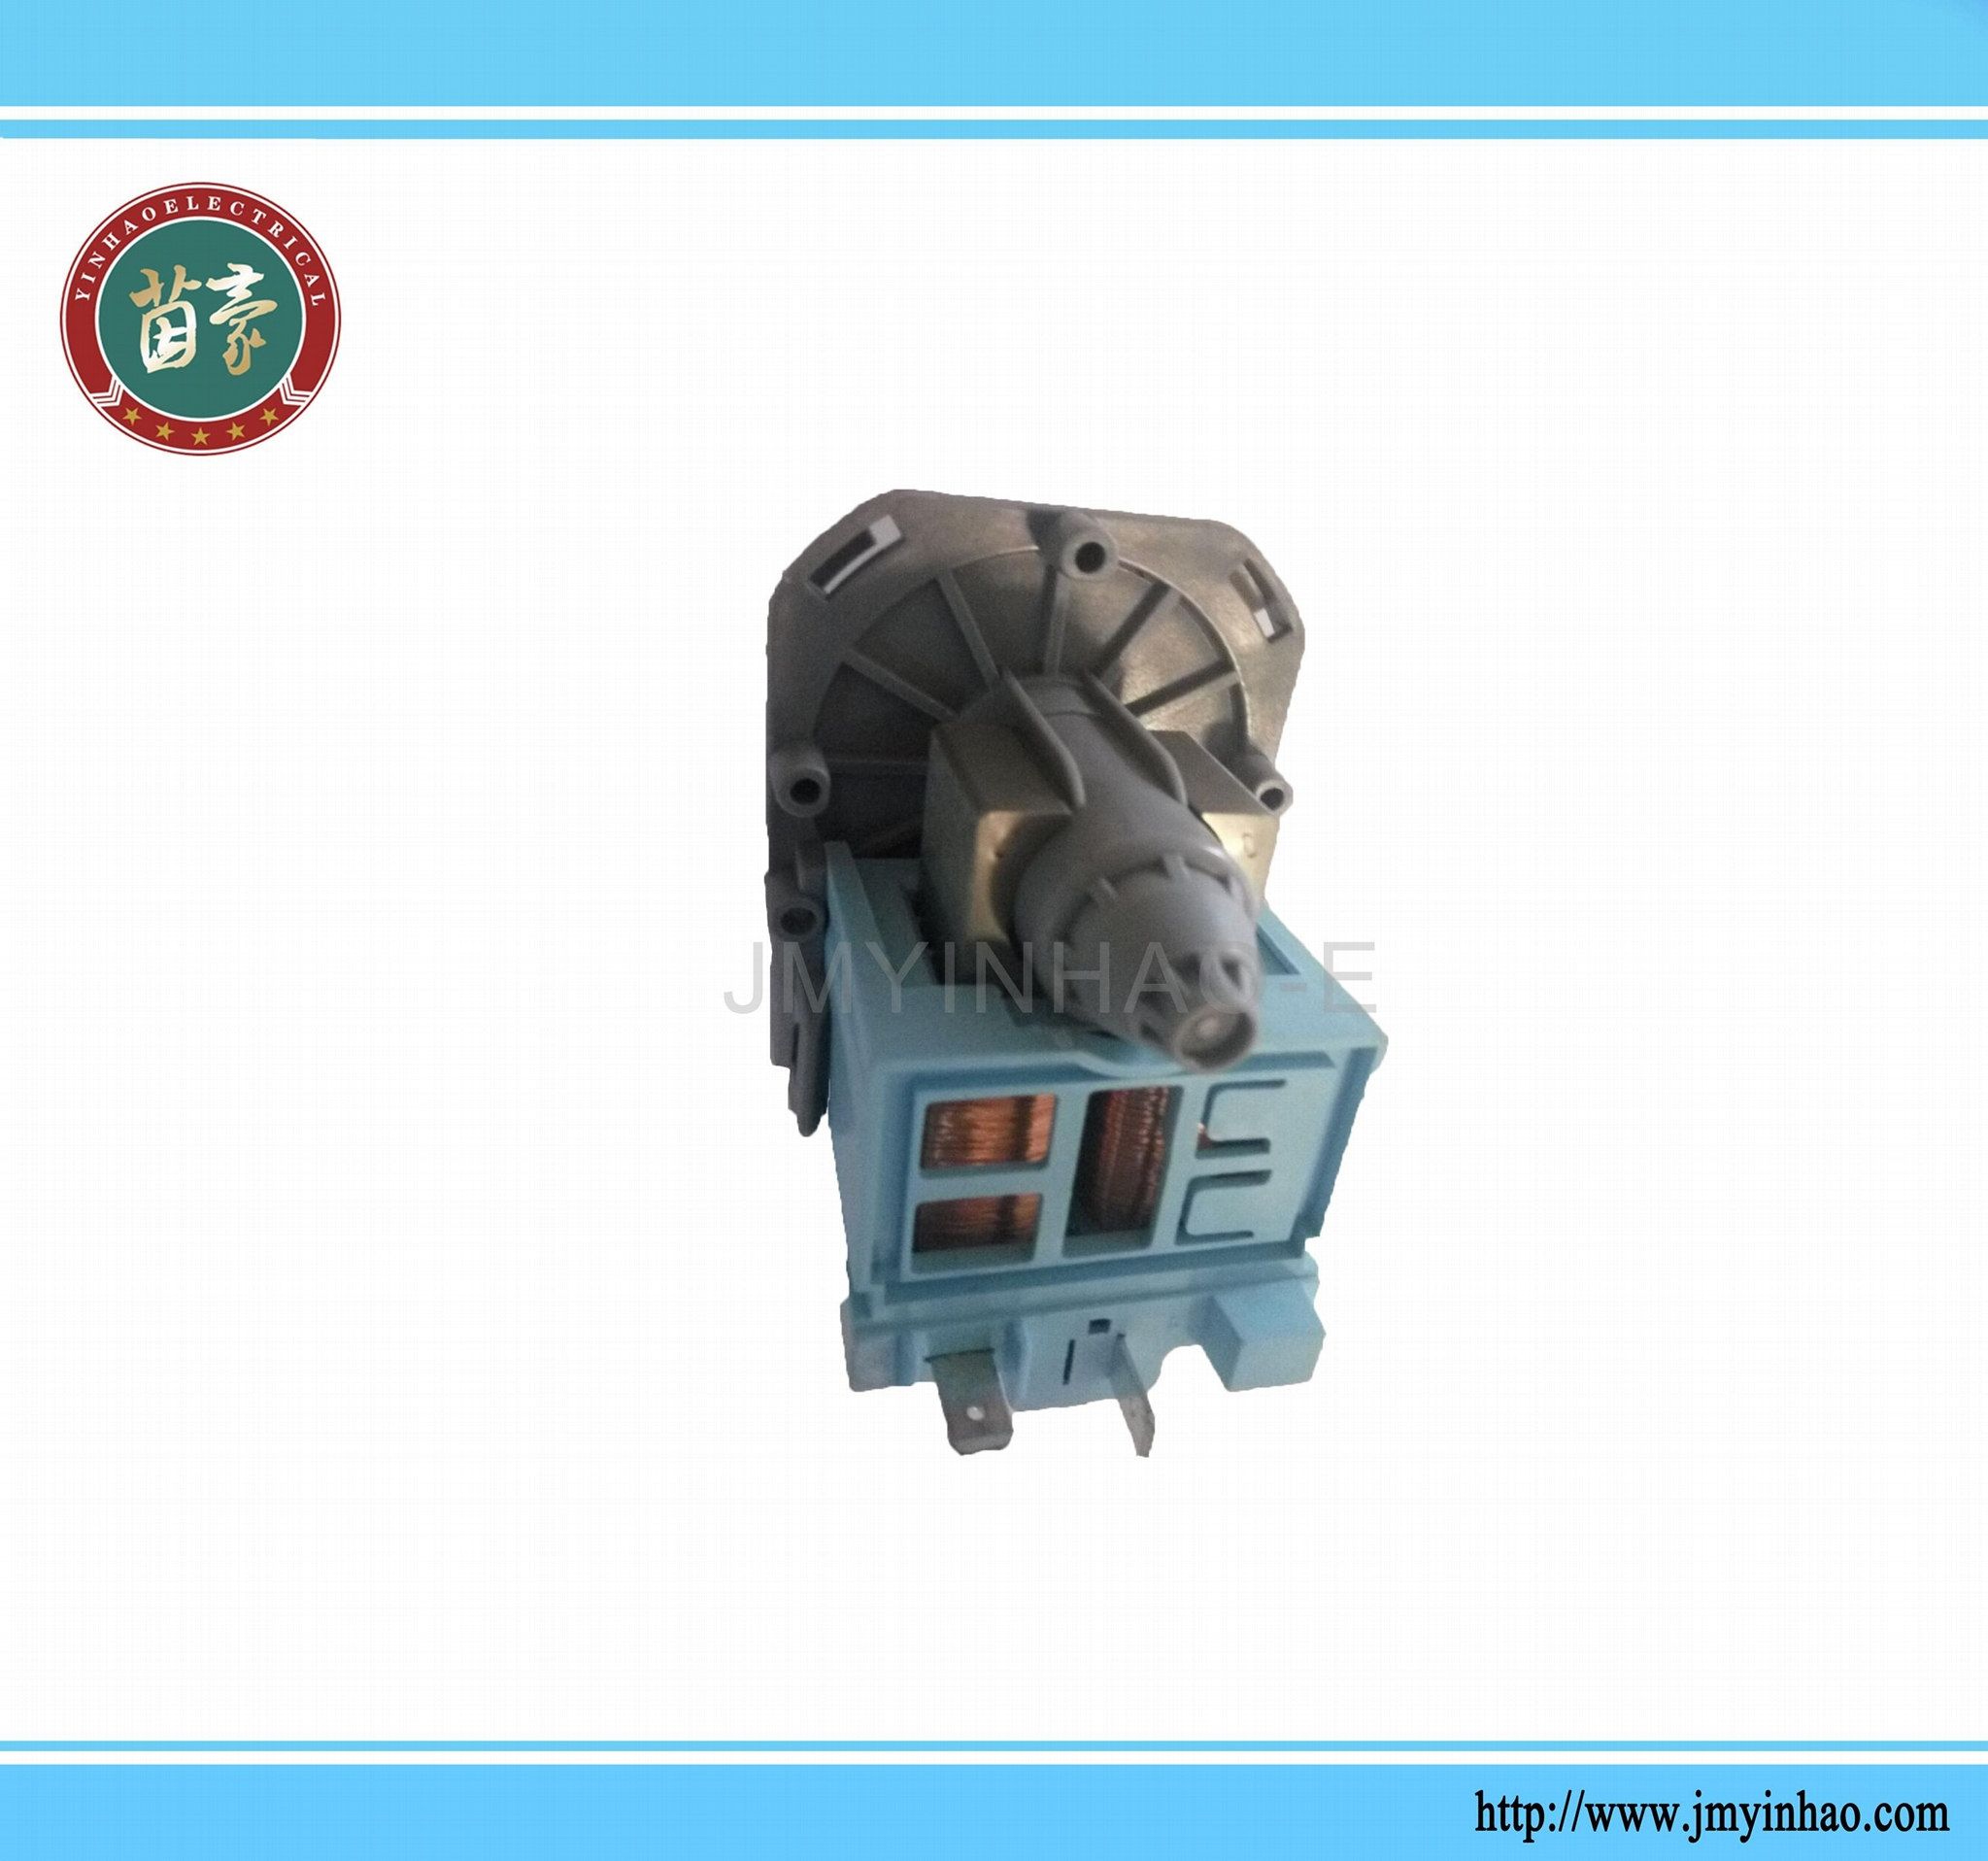 Replacement Zanussi Washing Machine Drain Pump Askoll M113 M109 1326630009 2